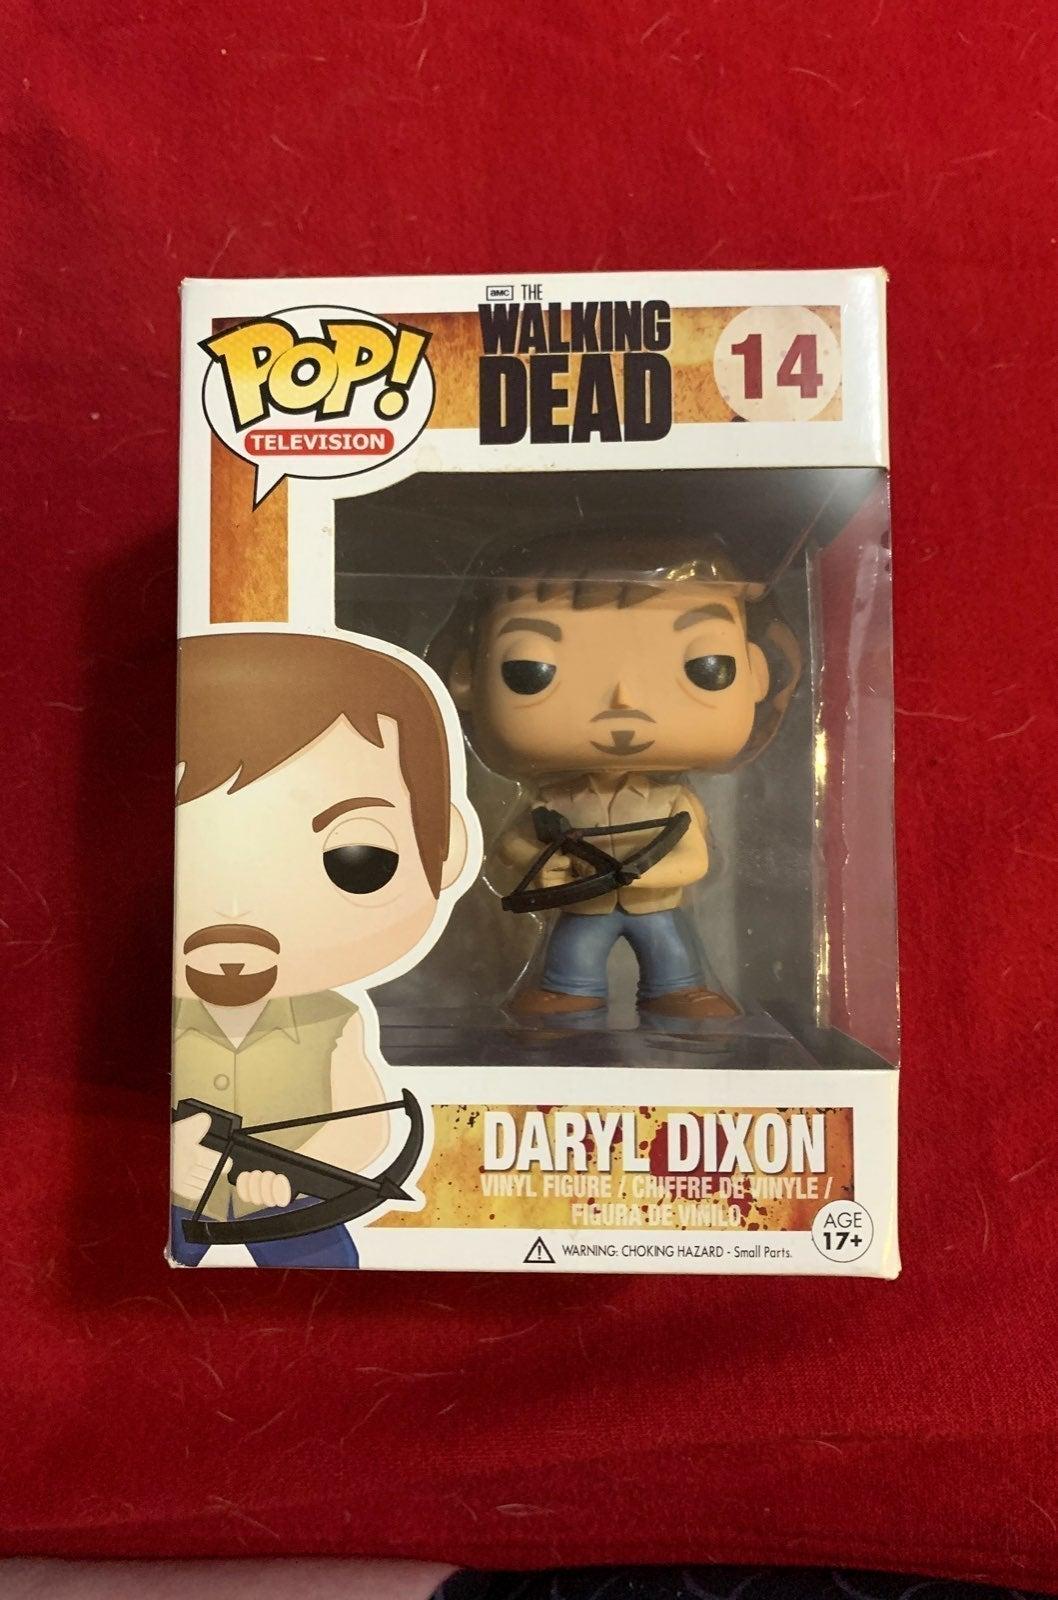 Walking Dead Funko Pop Daryl Dixon #14